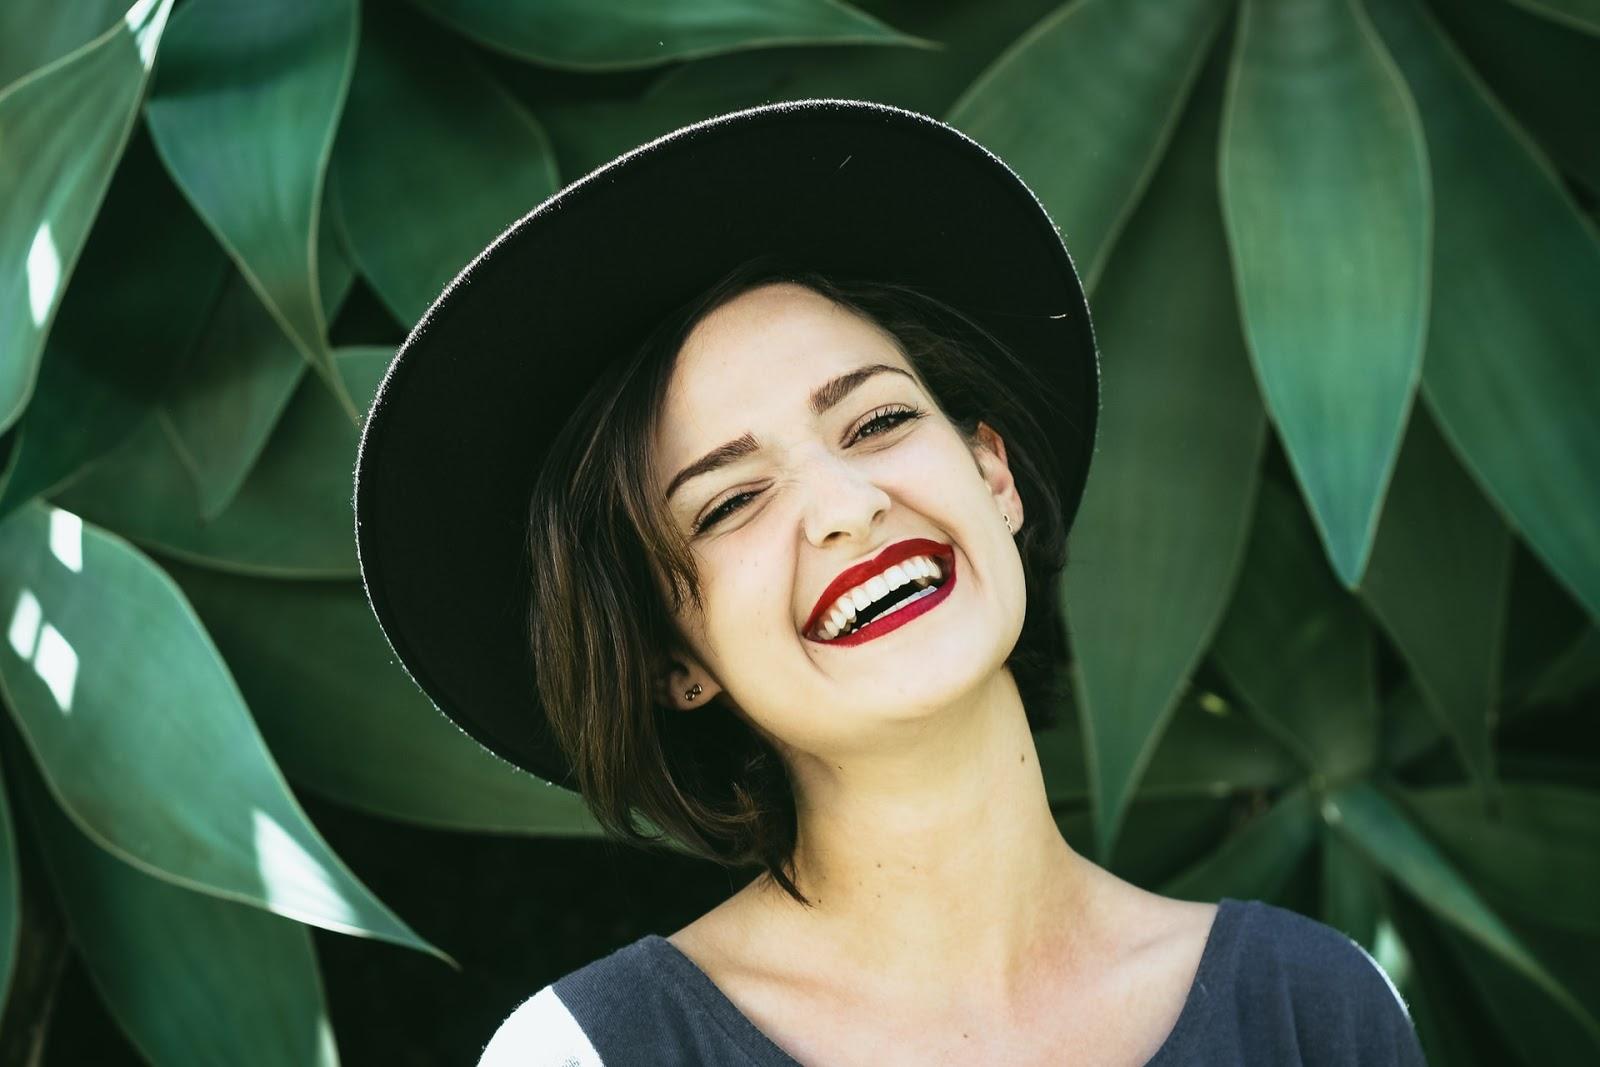 smiling brunette woman wearing a black hat